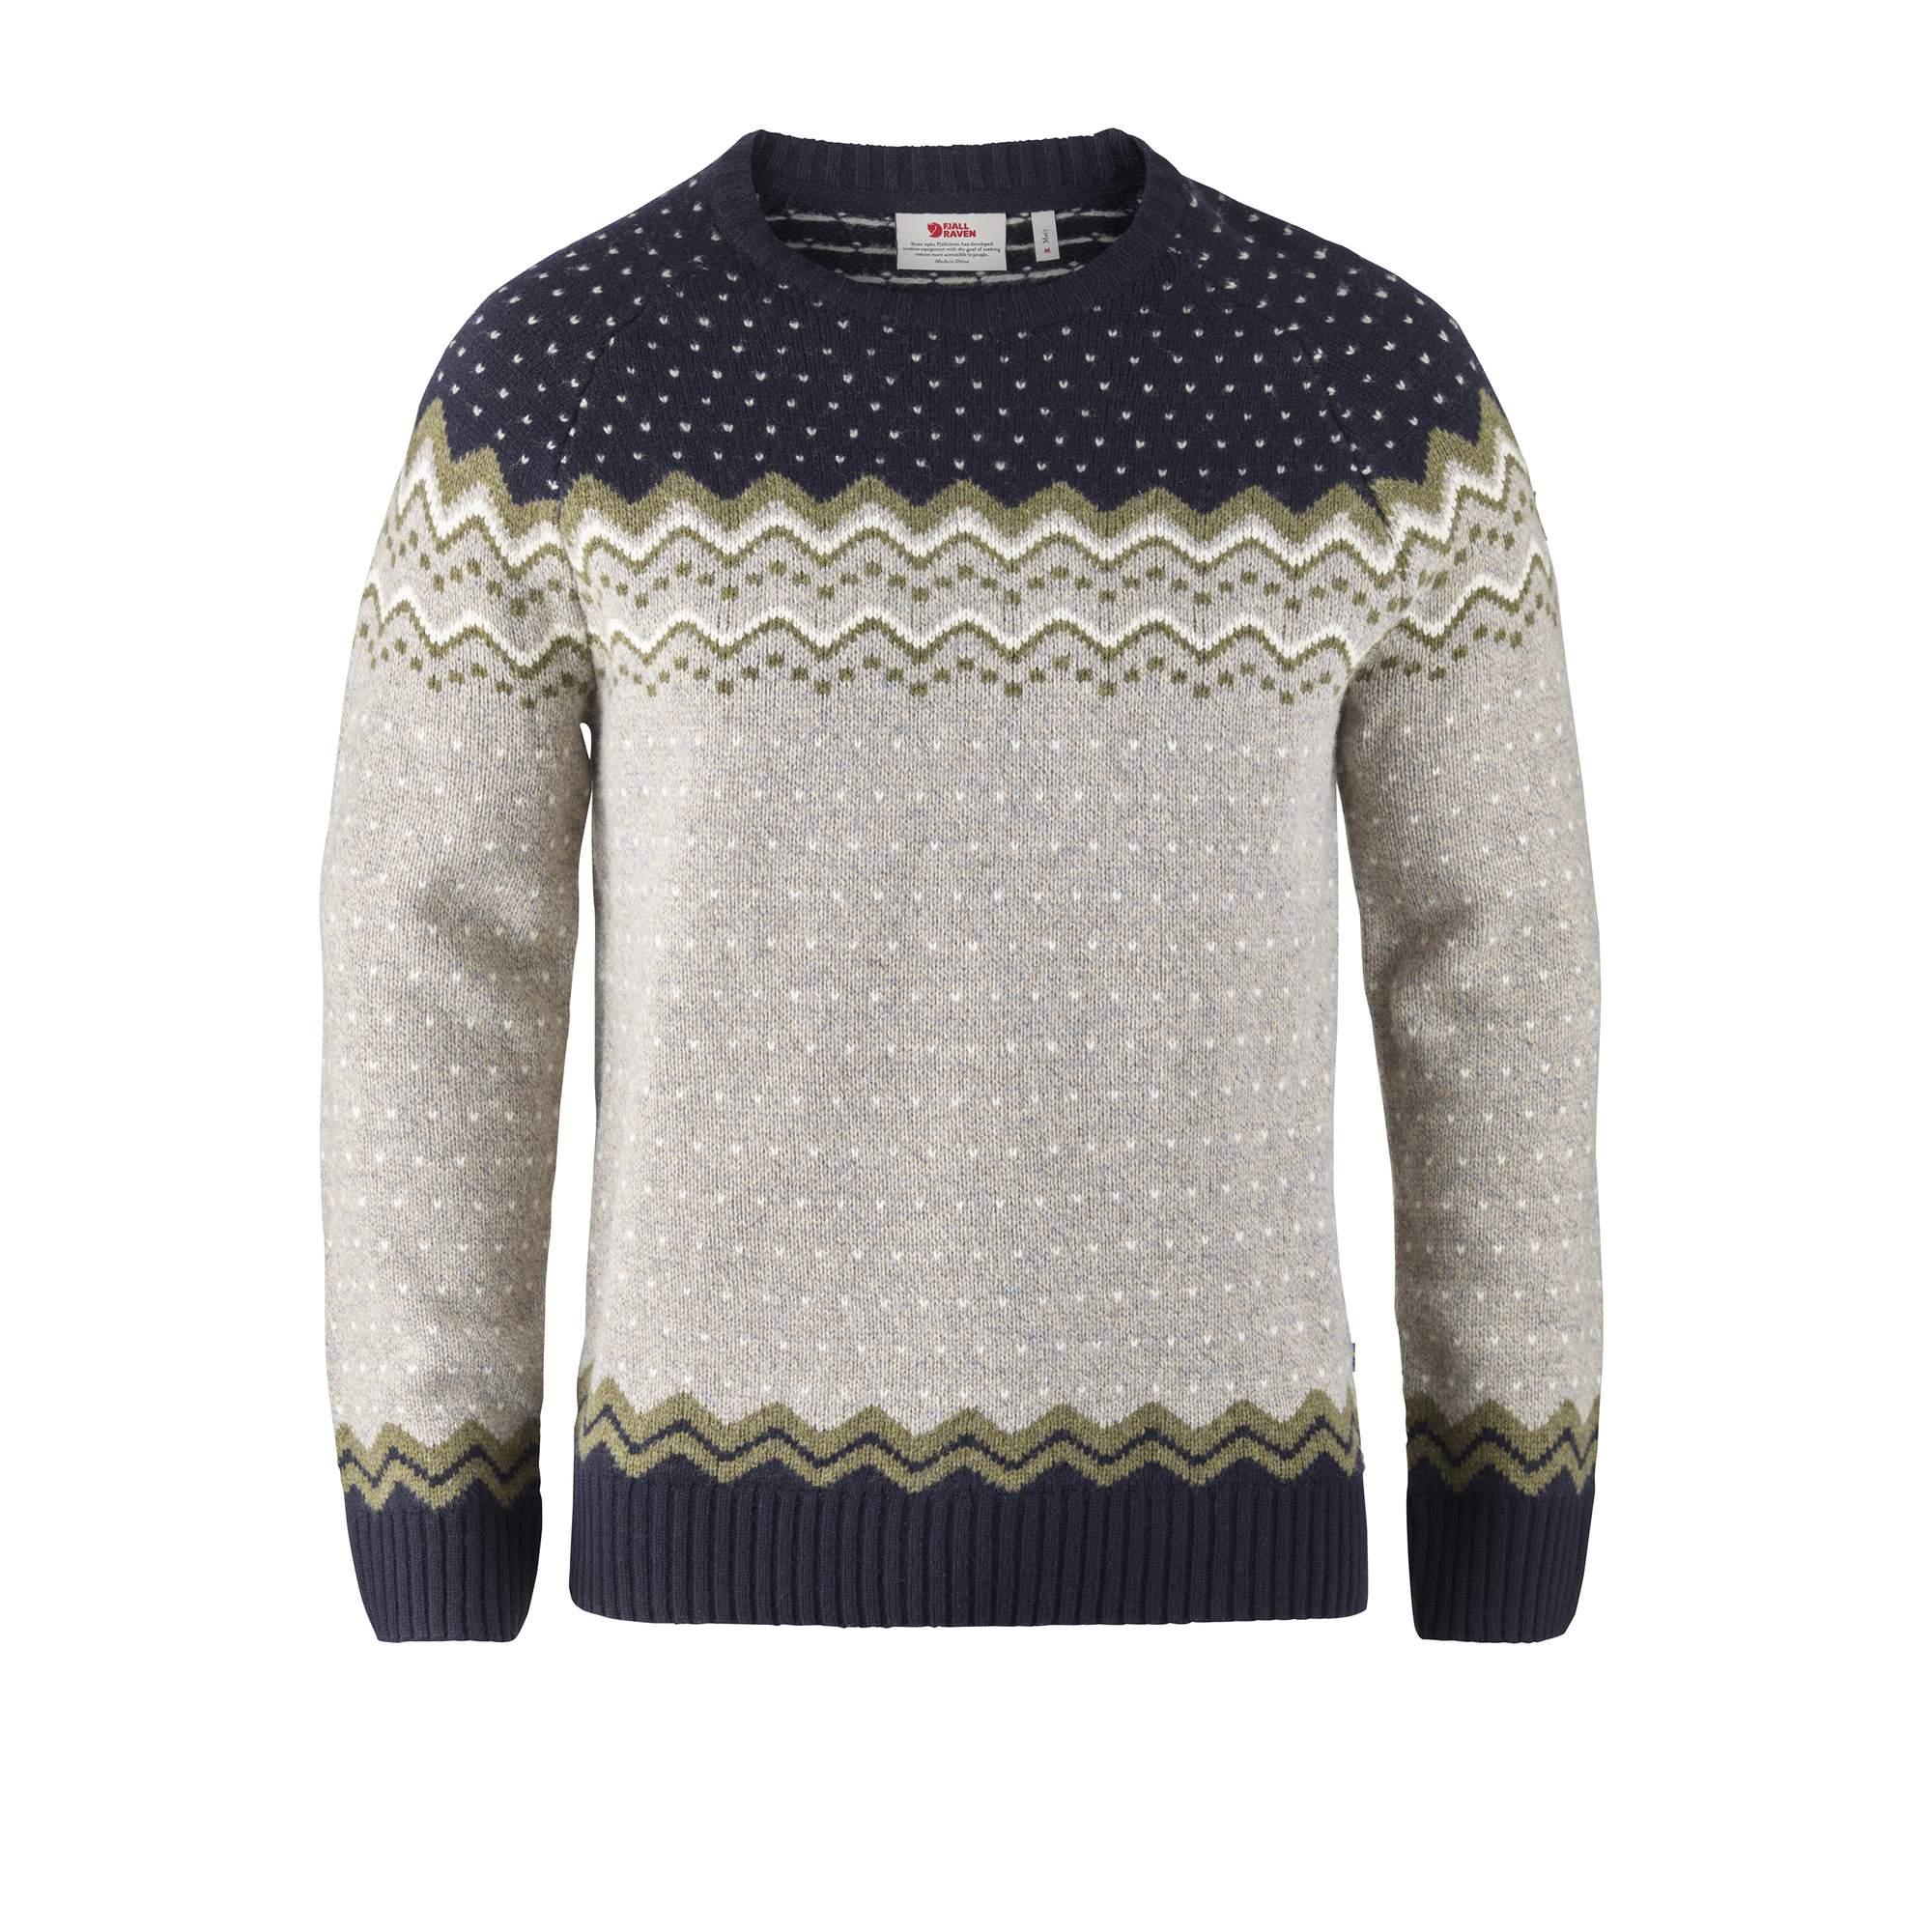 7323450369798_FW18_a_oevik_knit_sweater_m_21.jpg